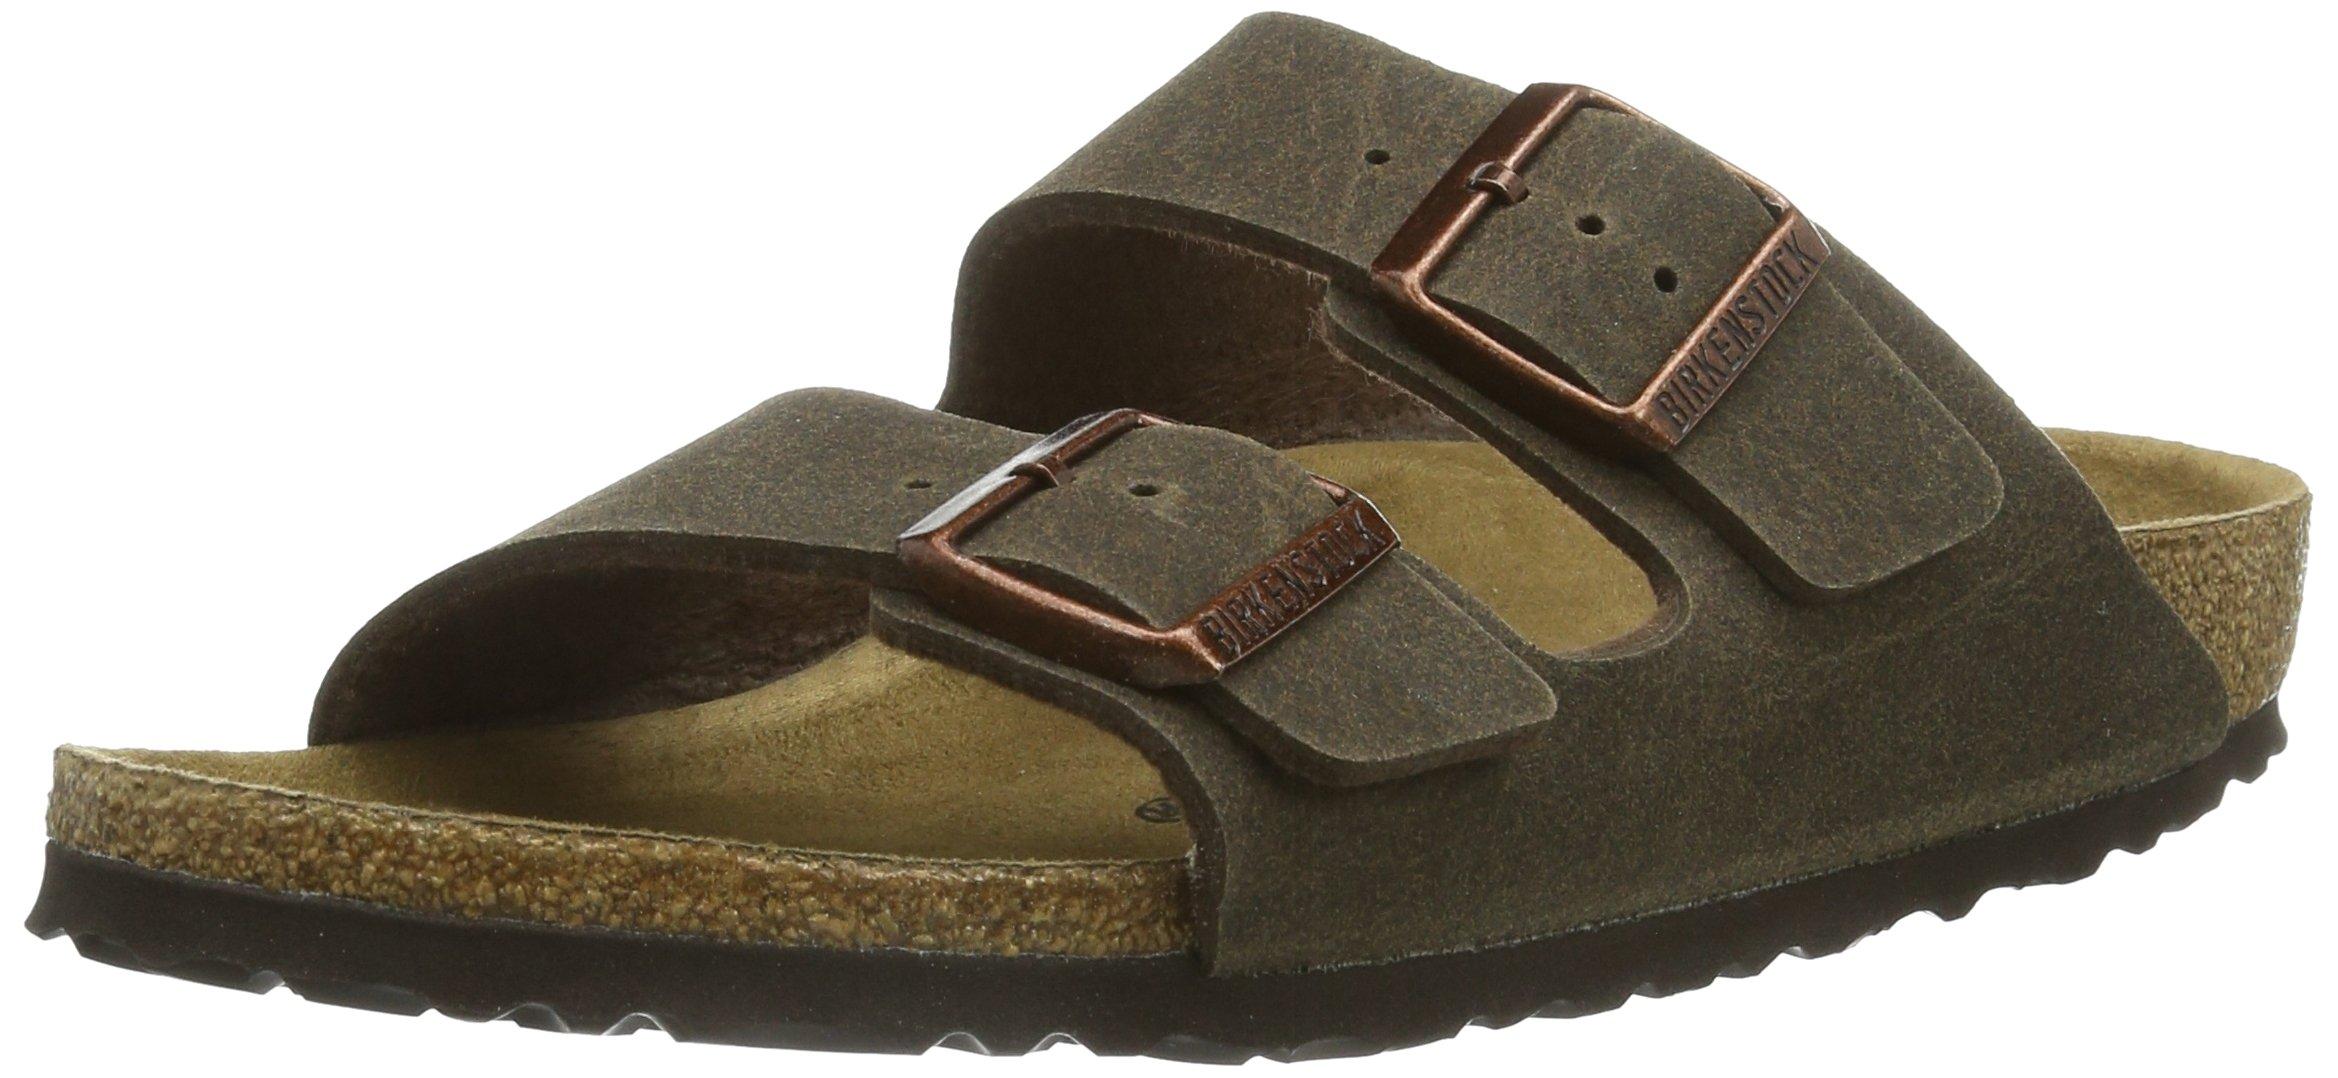 Birkenstock Women's Arizona  Birko-Flo Cacao Microfiber Sandals - 45 M EU / 12-12.5 D(M) US